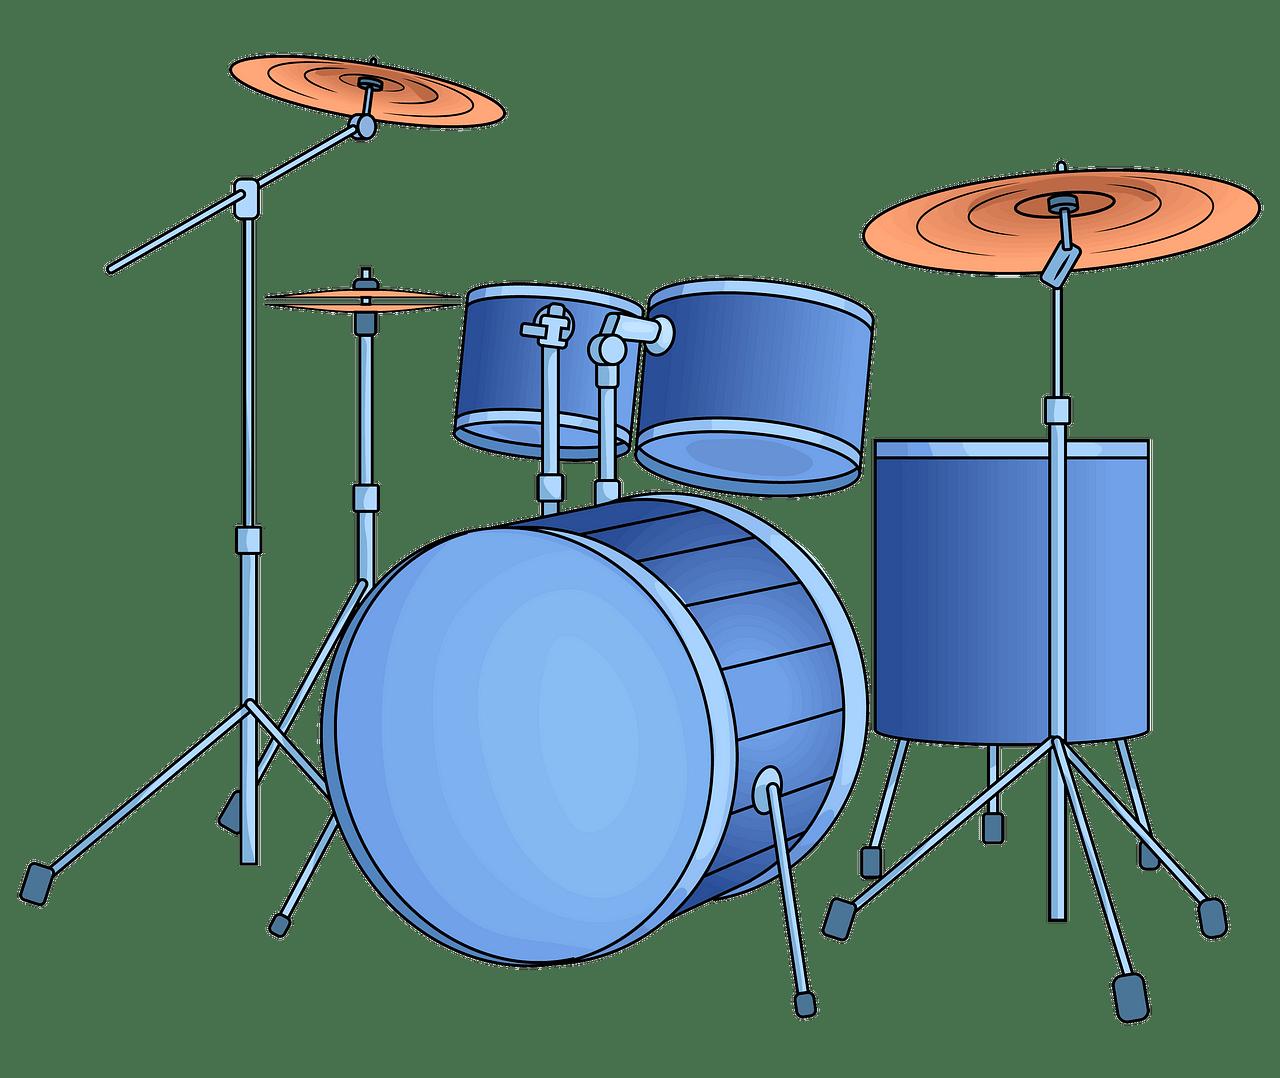 Drum kit clipart. Free download..